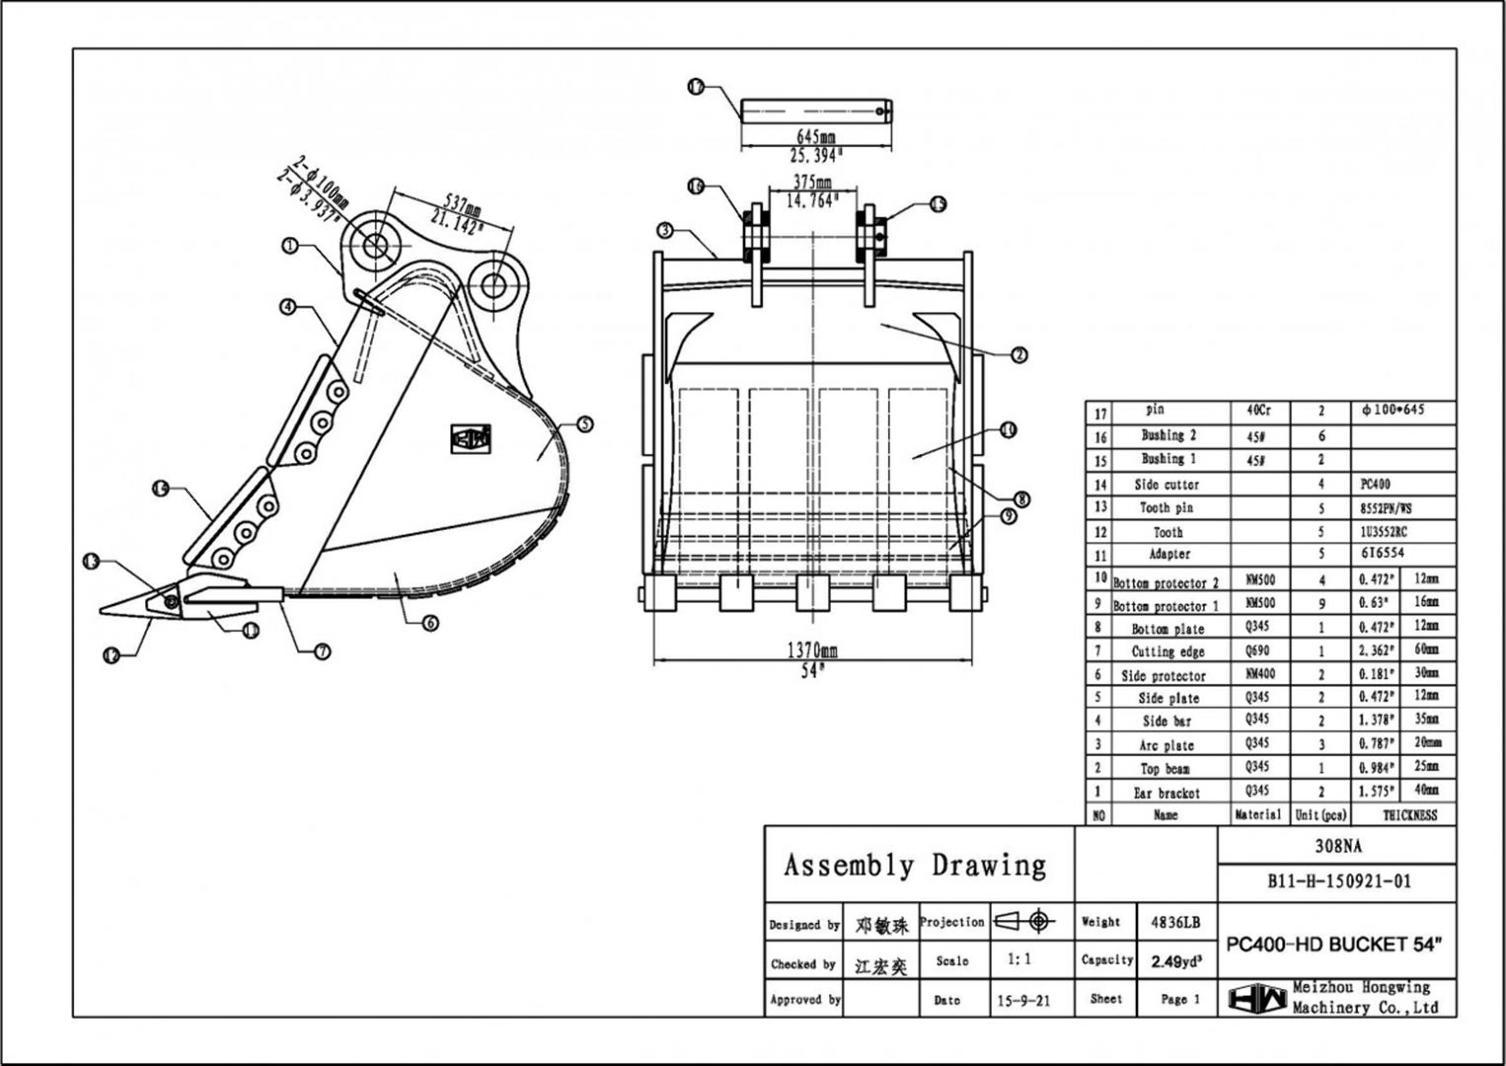 54 Heavy Duty Excavator Bucket Komatsu Pc400 100mm Pins